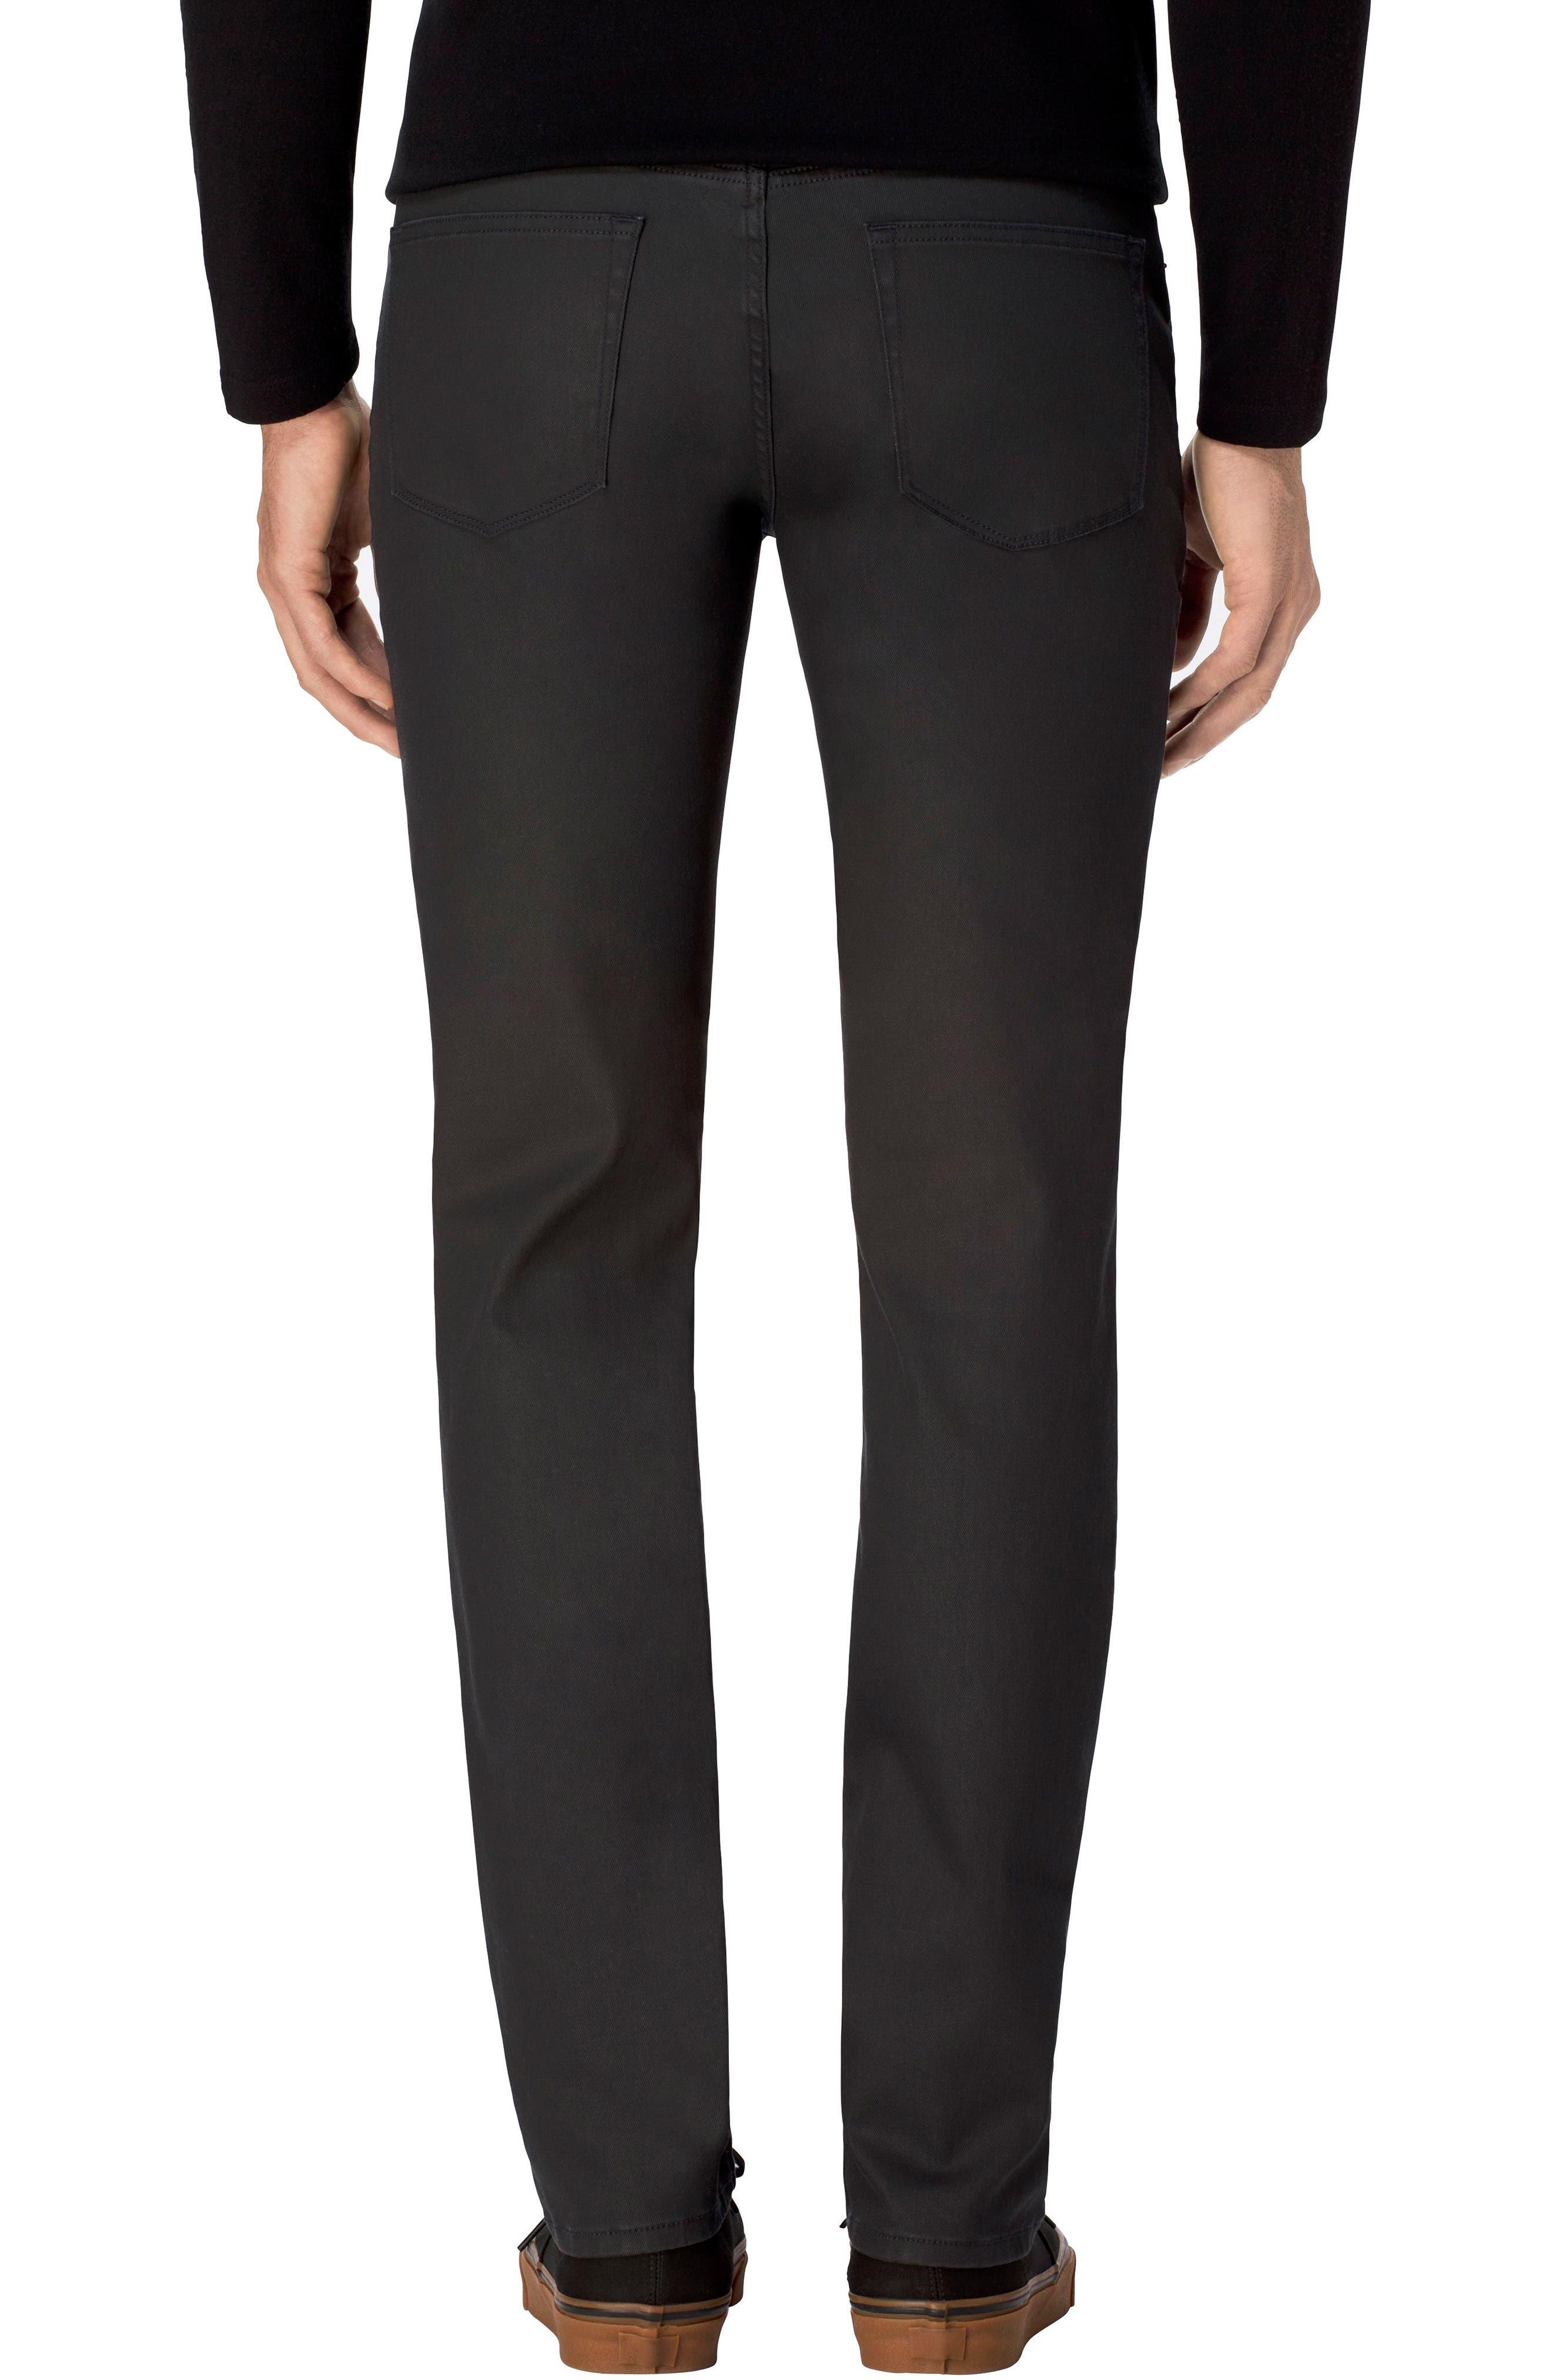 Kane Slim Straight Fit Jeans,                             Alternate thumbnail 2, color,                             022